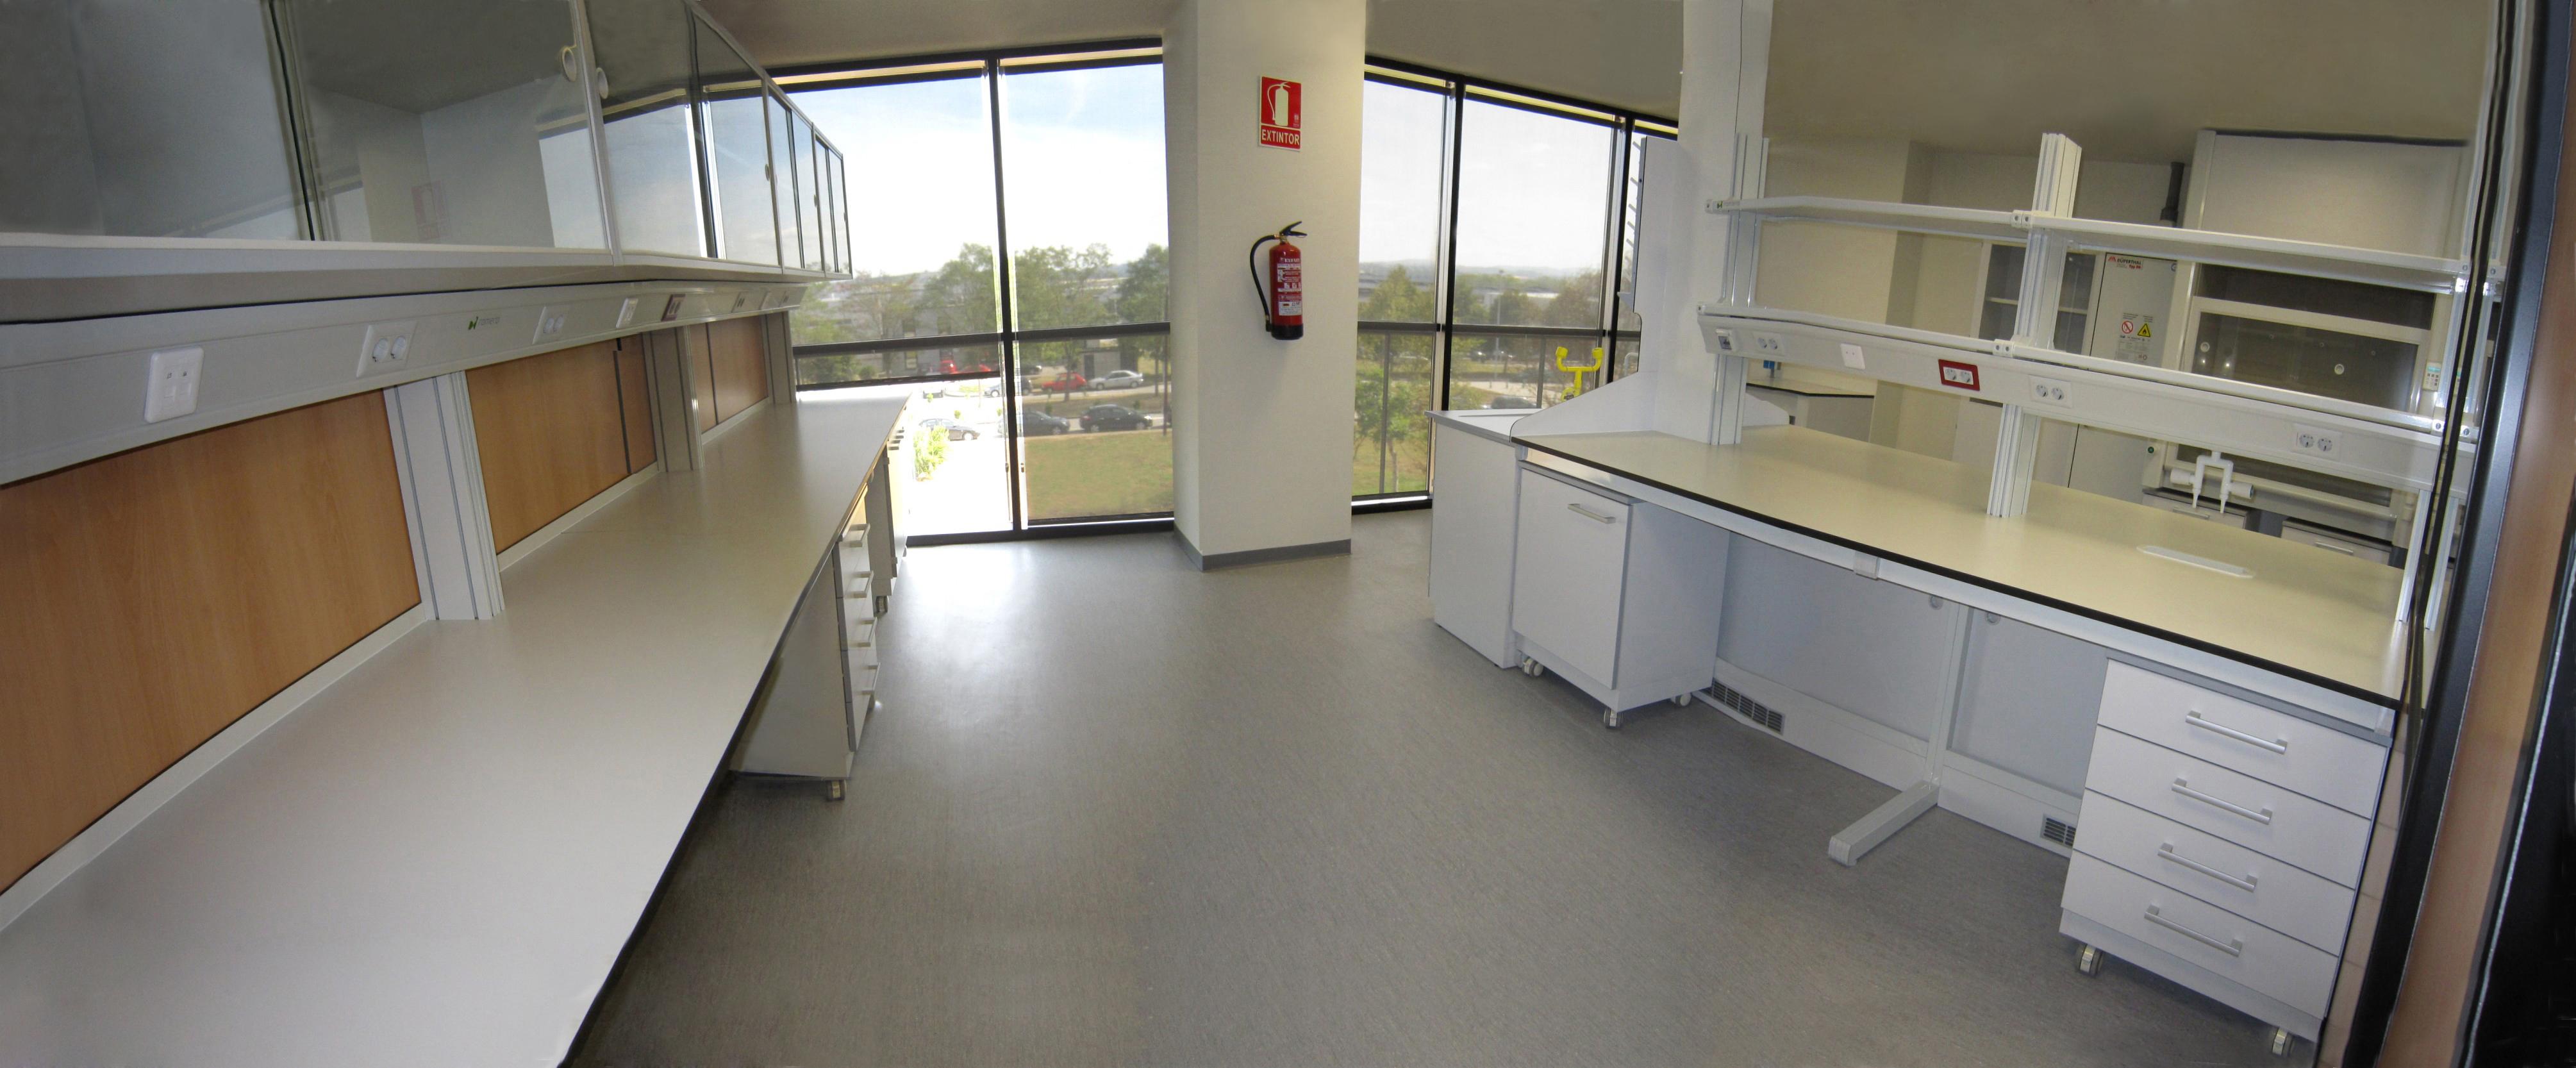 Laboratorio Pan2 T